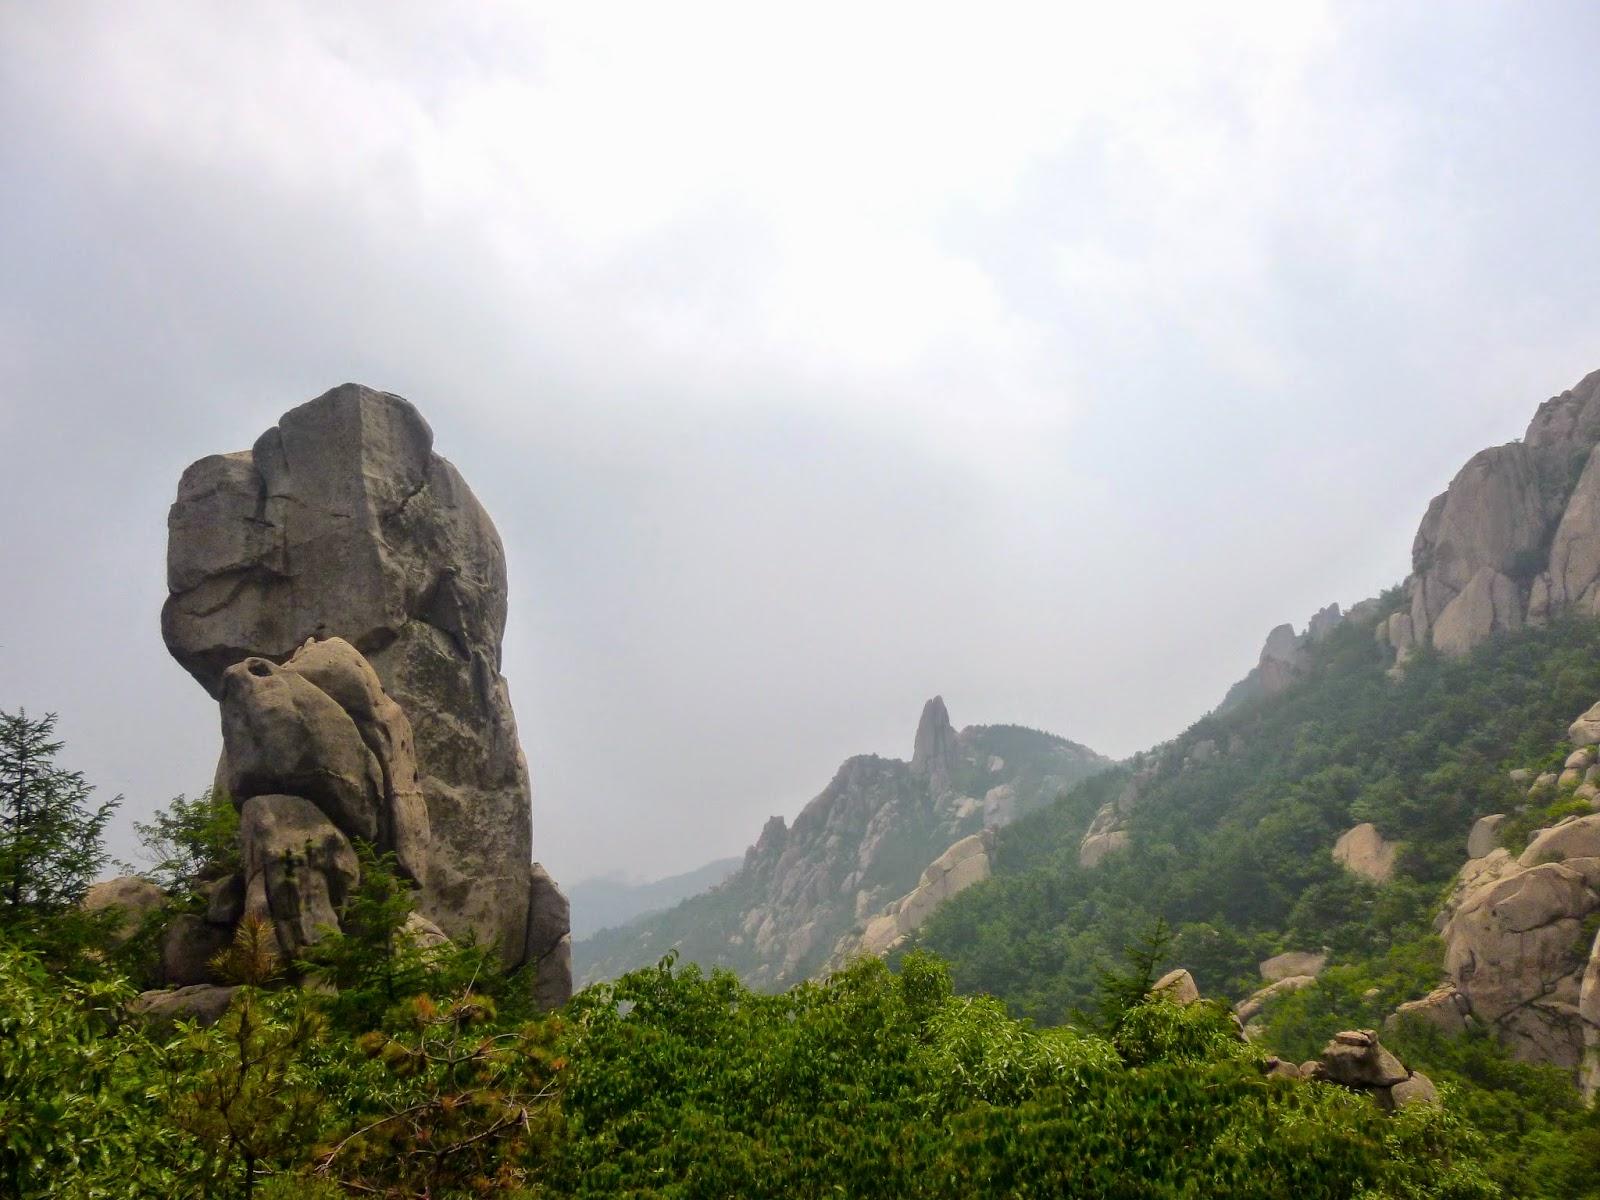 Mount Lao (Laoshan) Jufeng Scenic Area - That's Qingdao